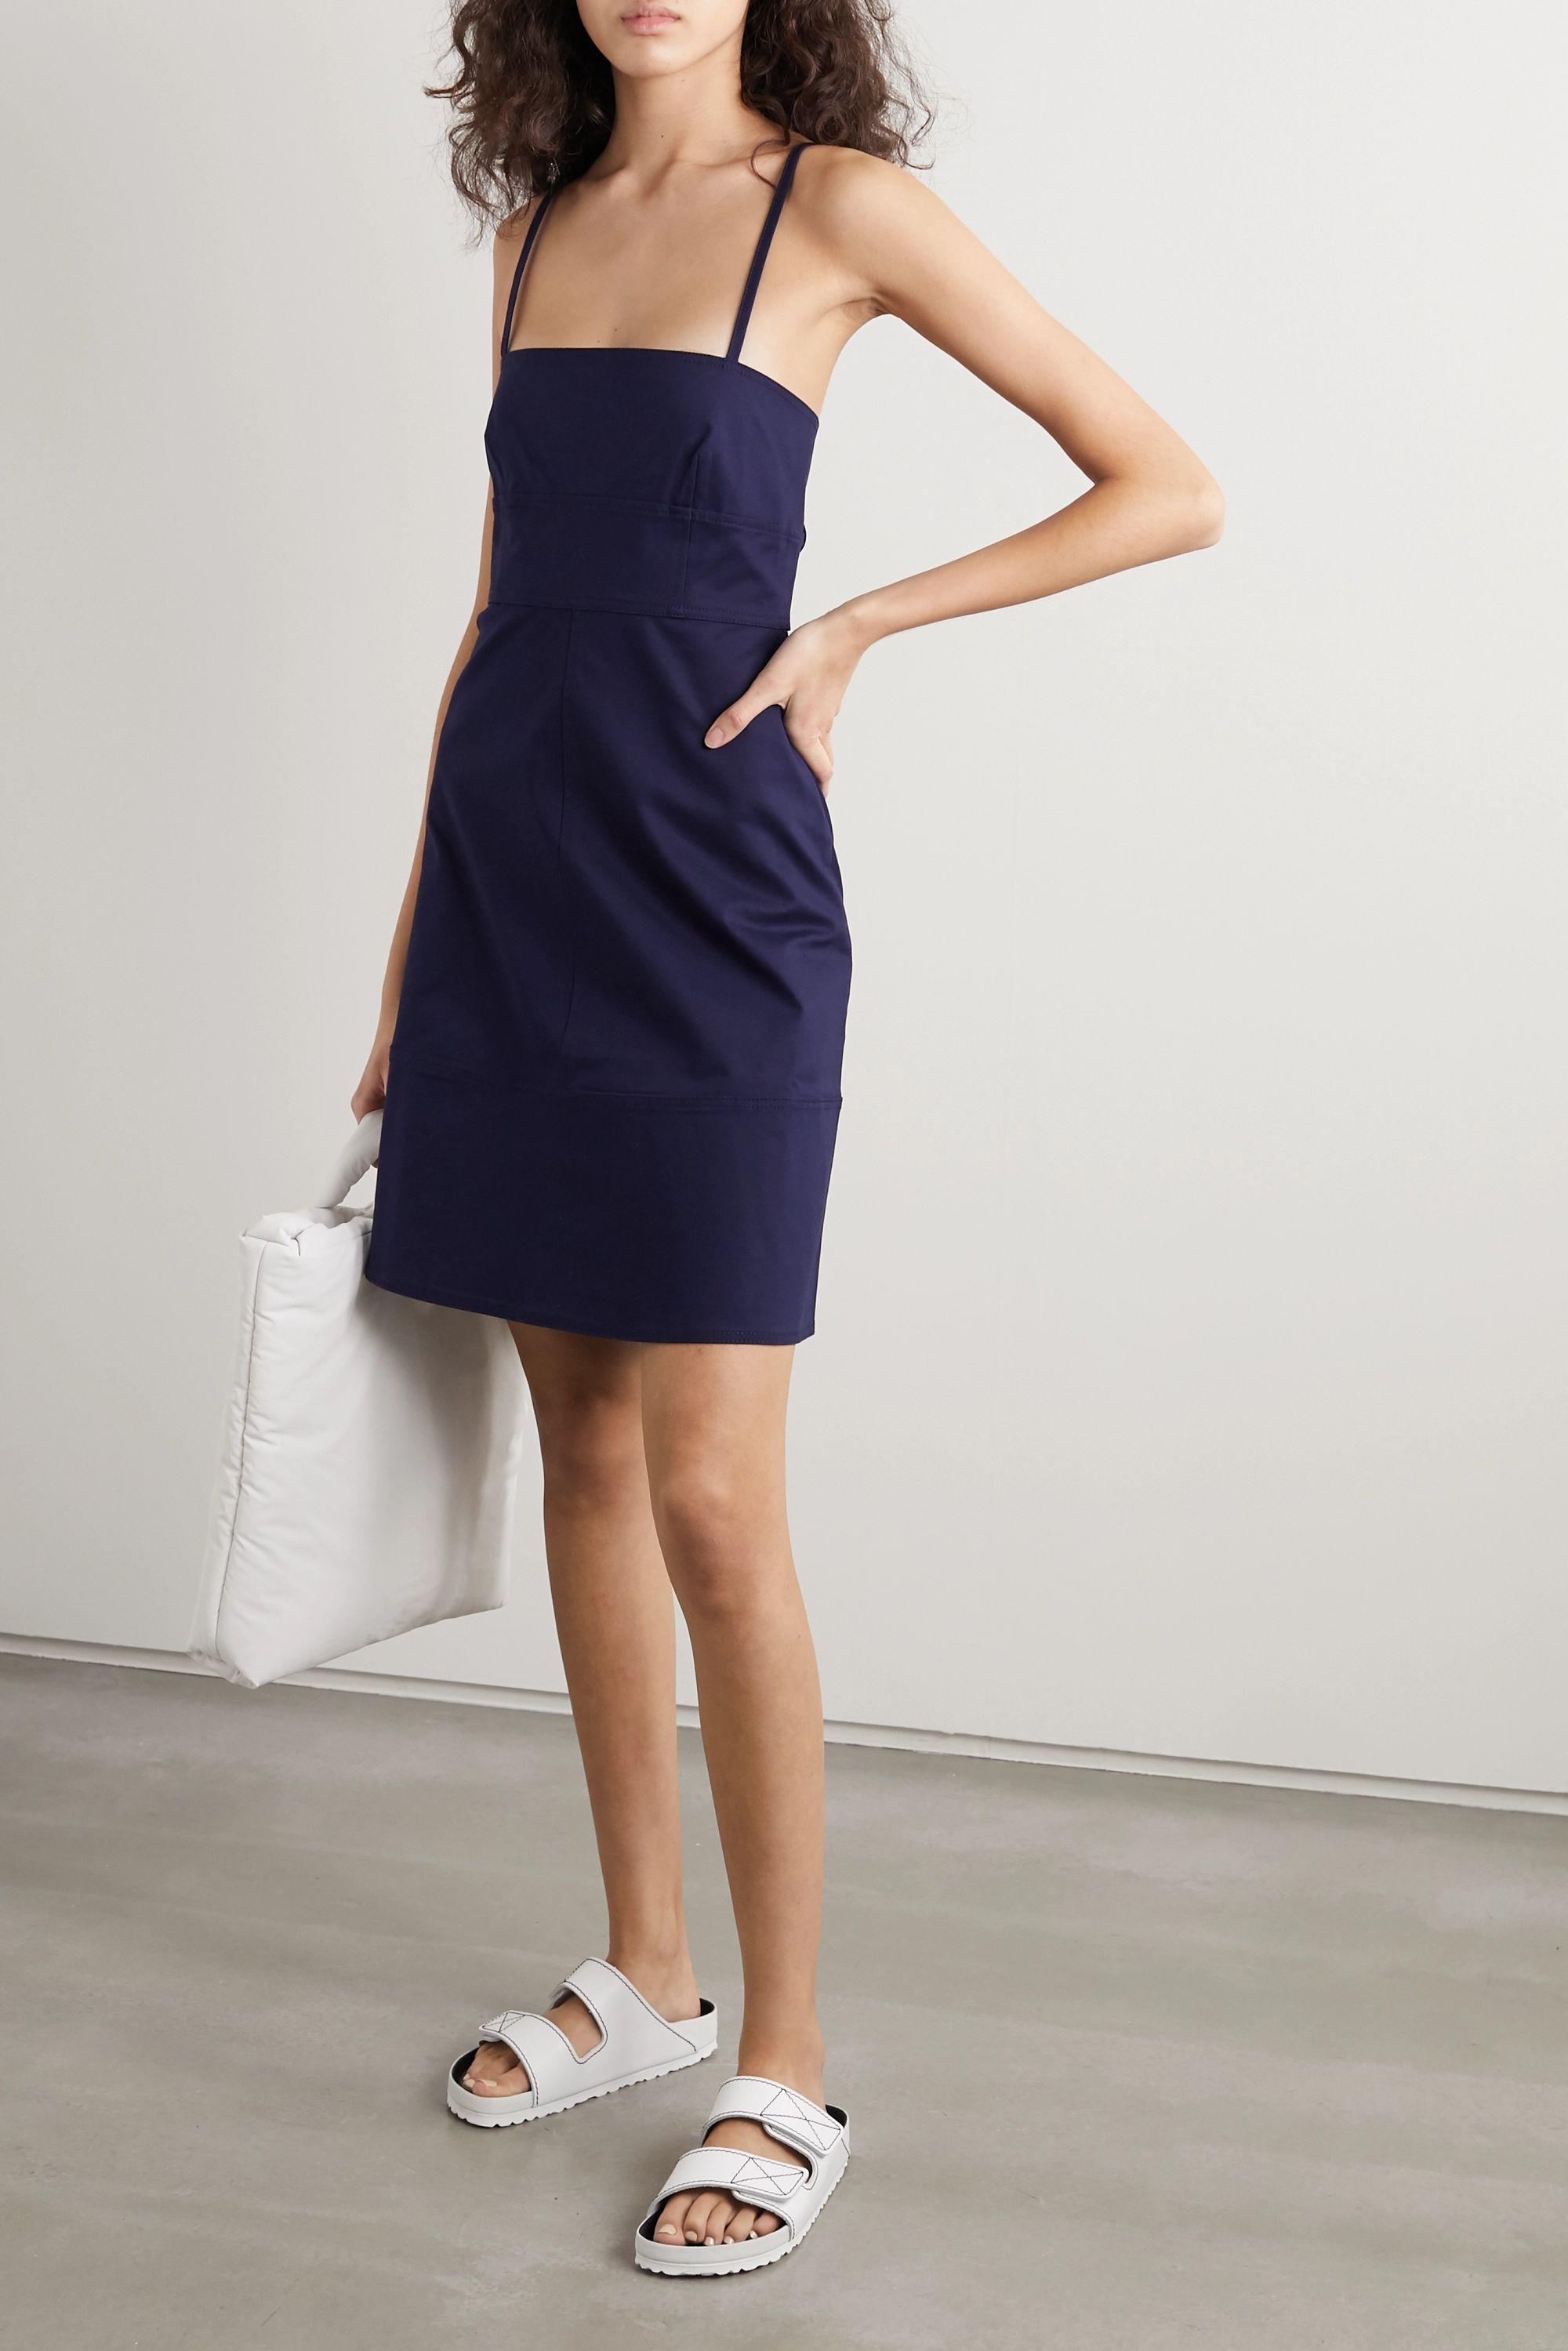 Proenza Schouler White Label Cutout cotton-blend mini dress